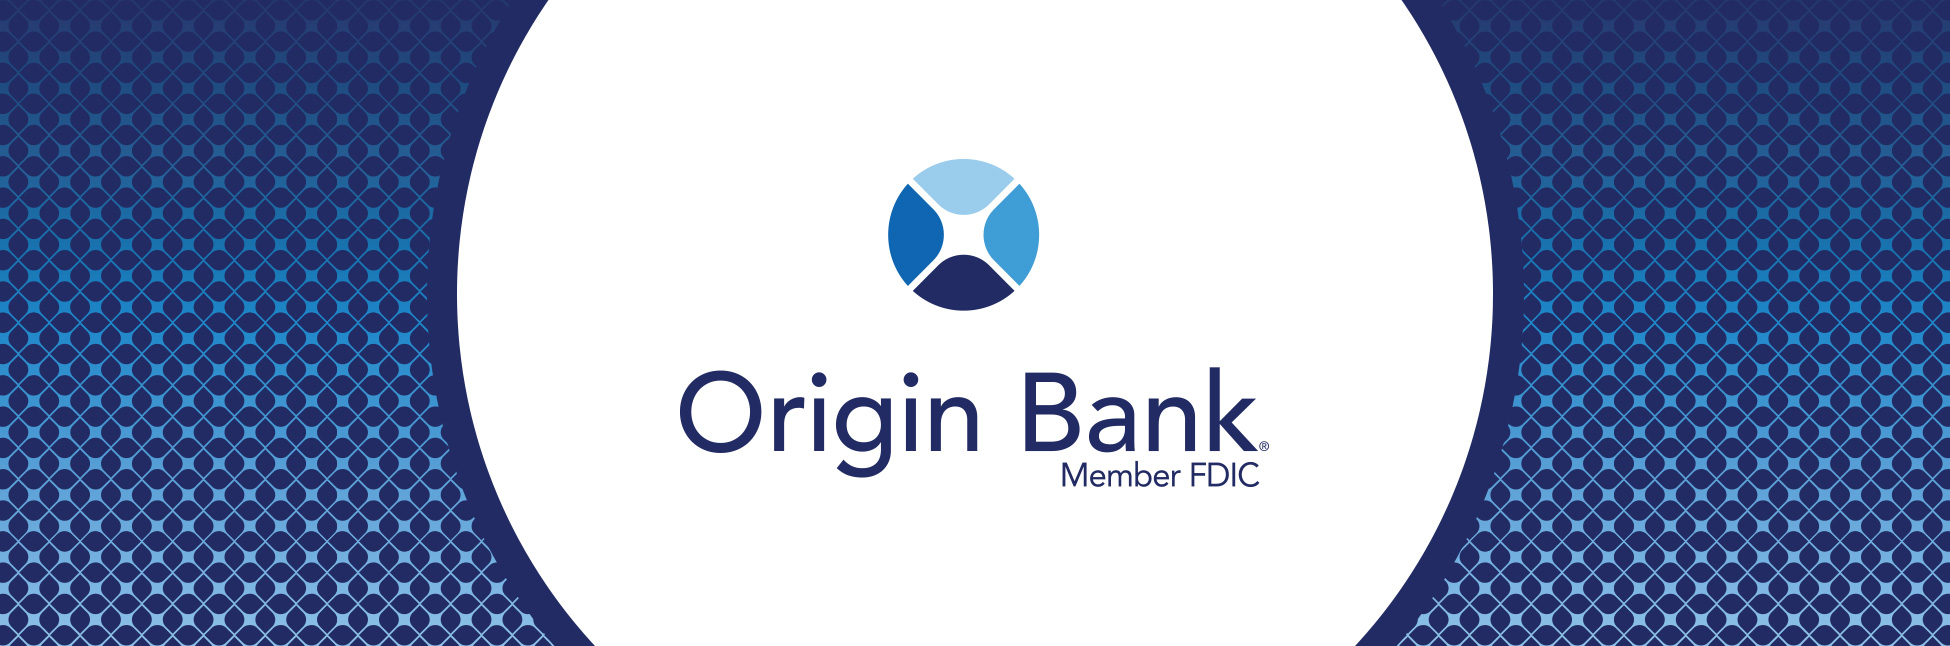 Graphic Designers for Origin Bank